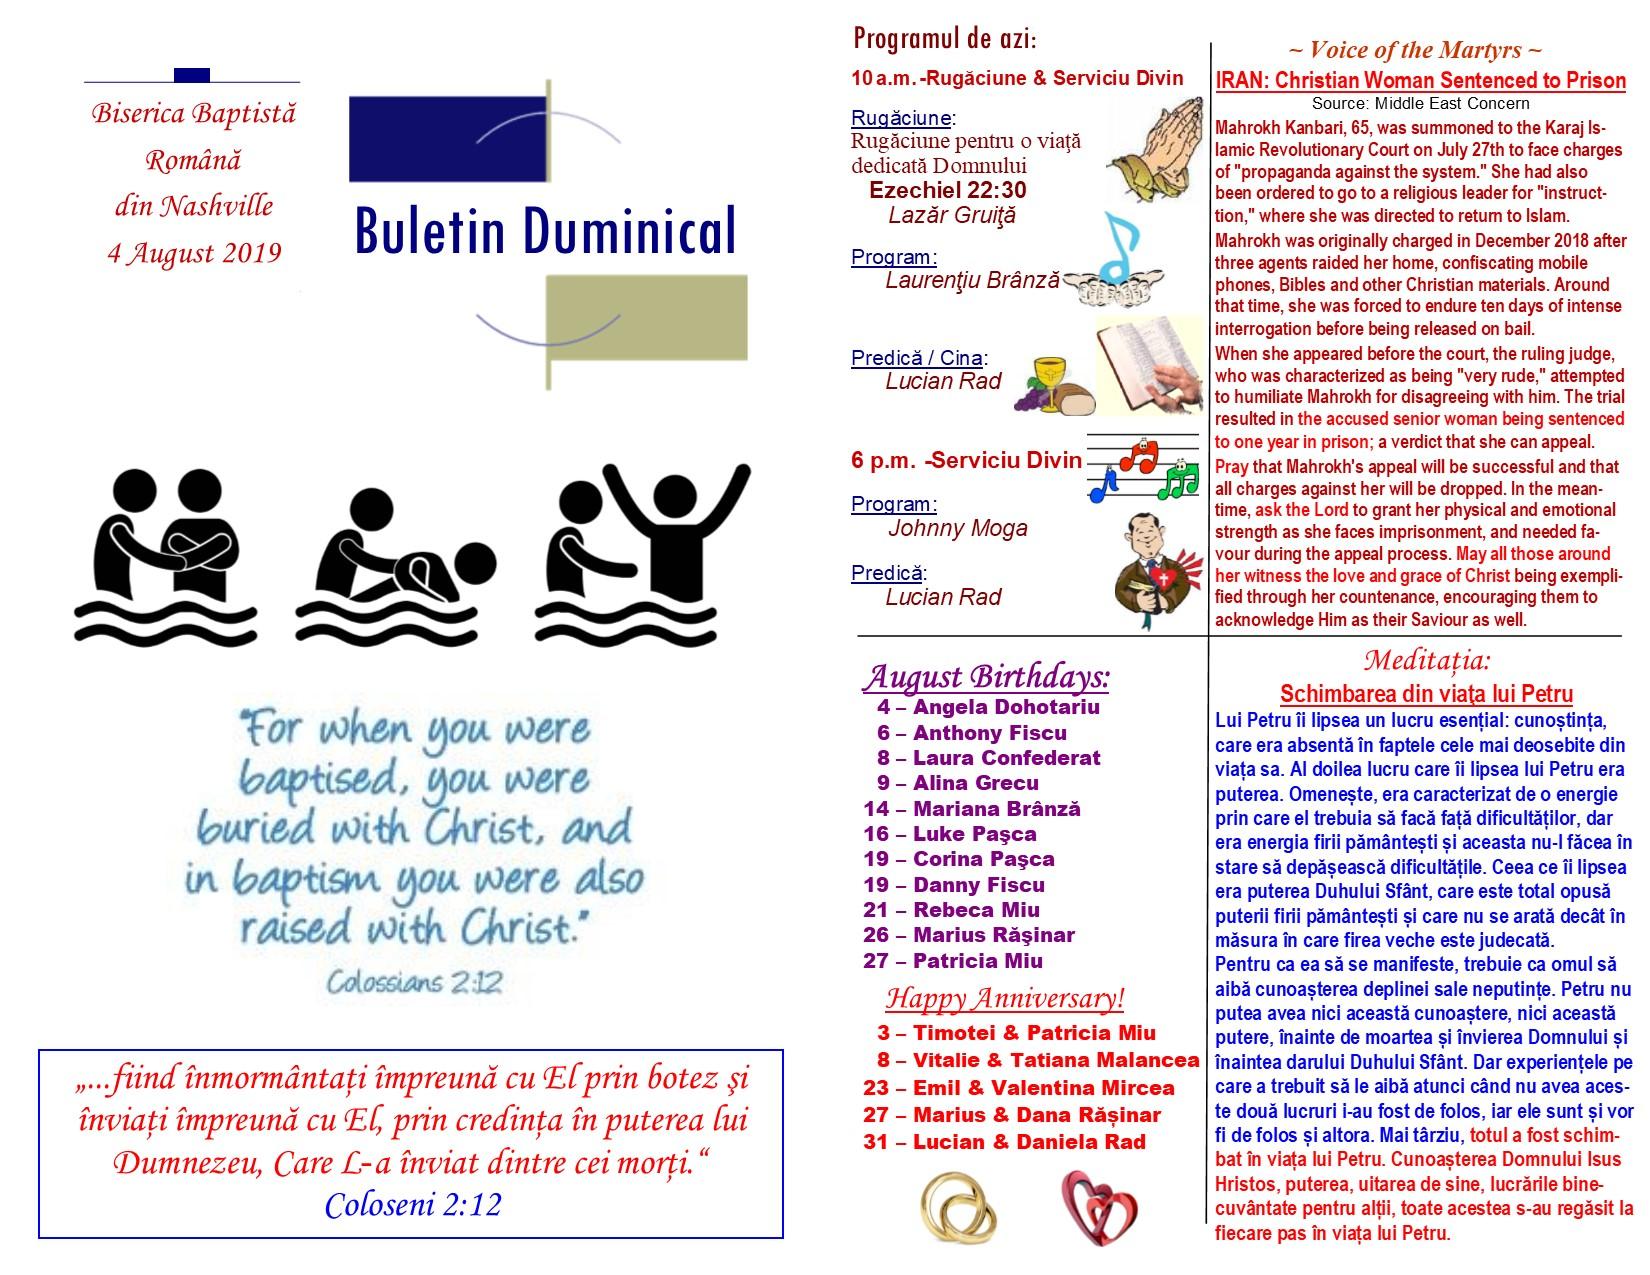 Buletin 08-04-19 page 1 & 2